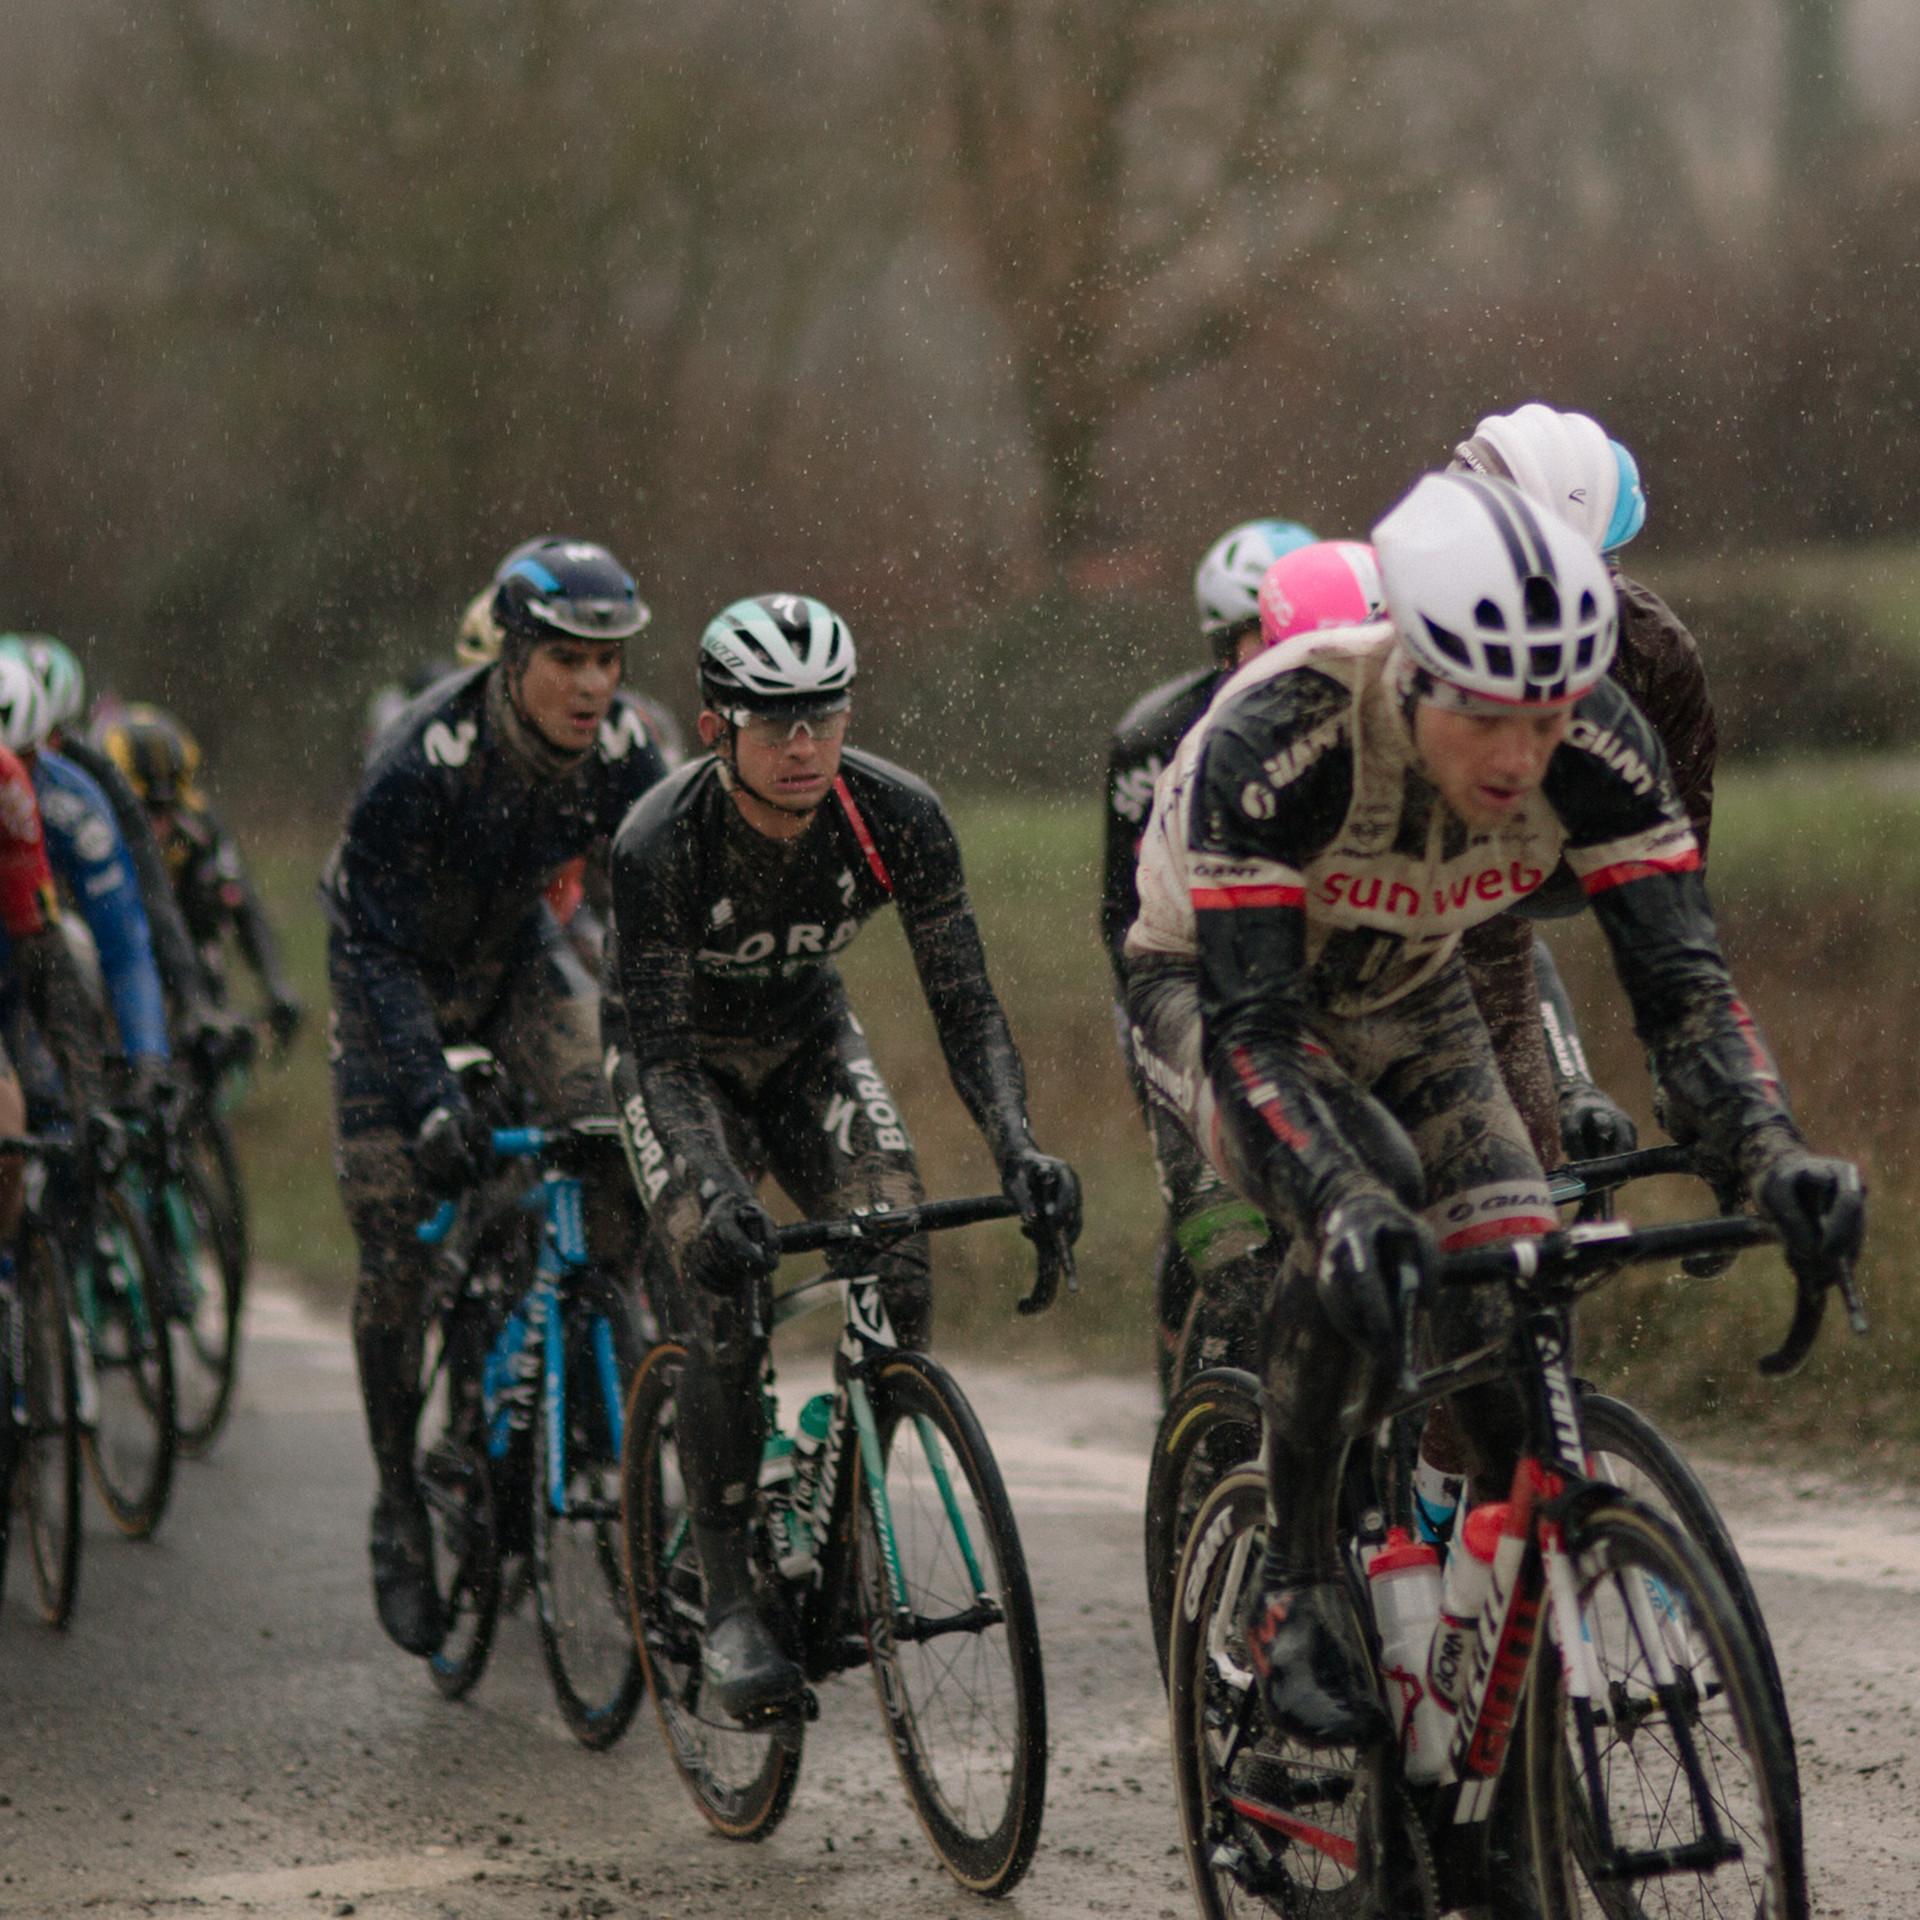 Strade Bianche Race Peloton